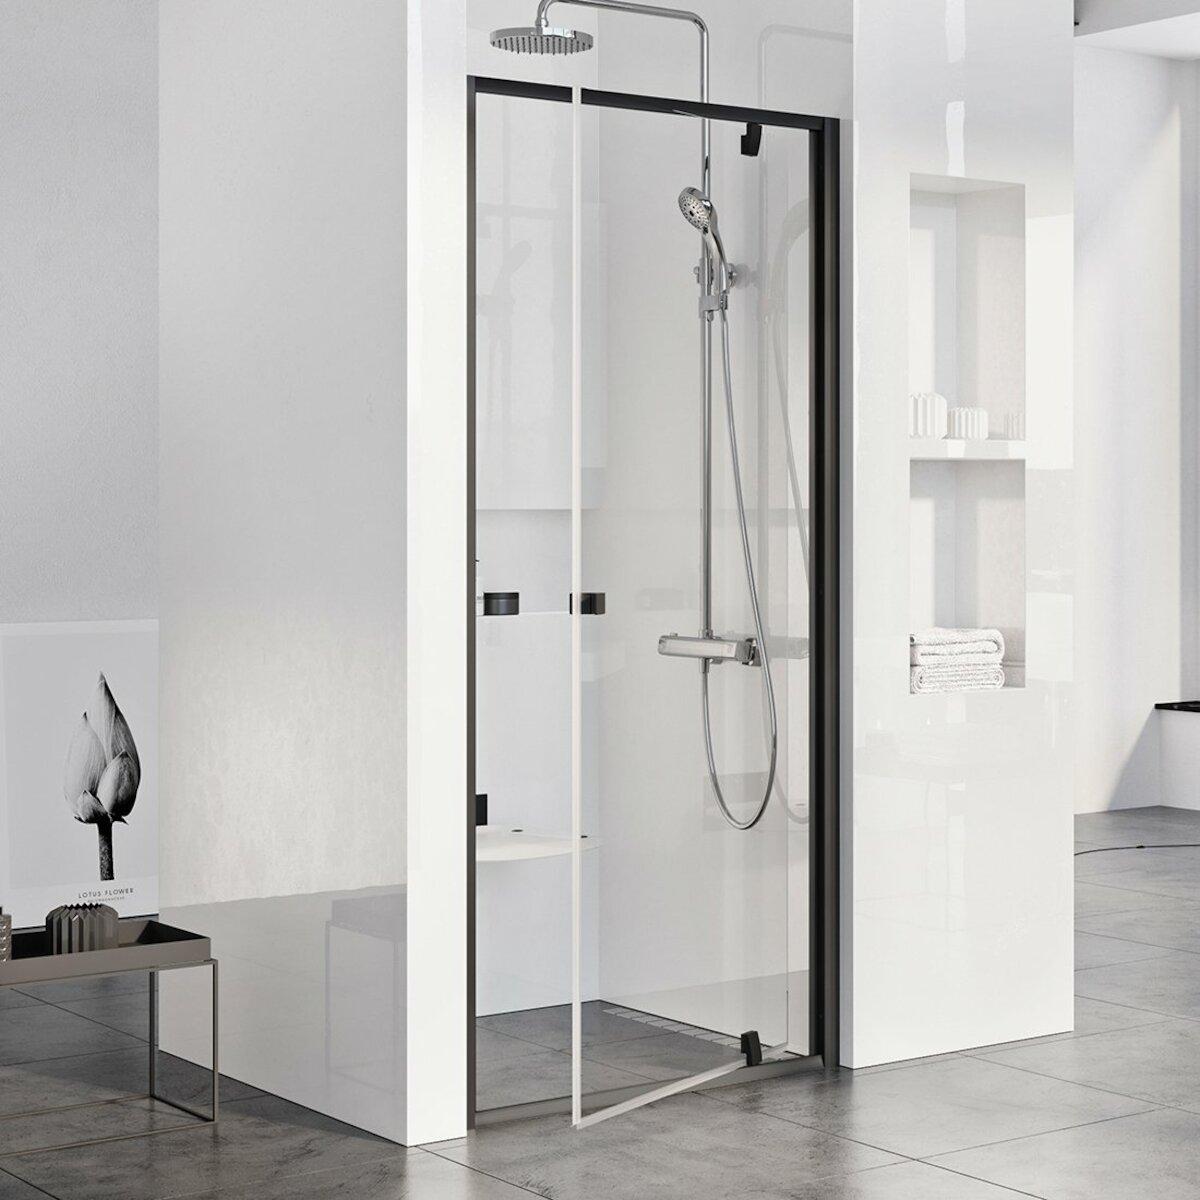 Sprchové dvere 80x190 cm Ravak Pivot čierna 03G40300Z1